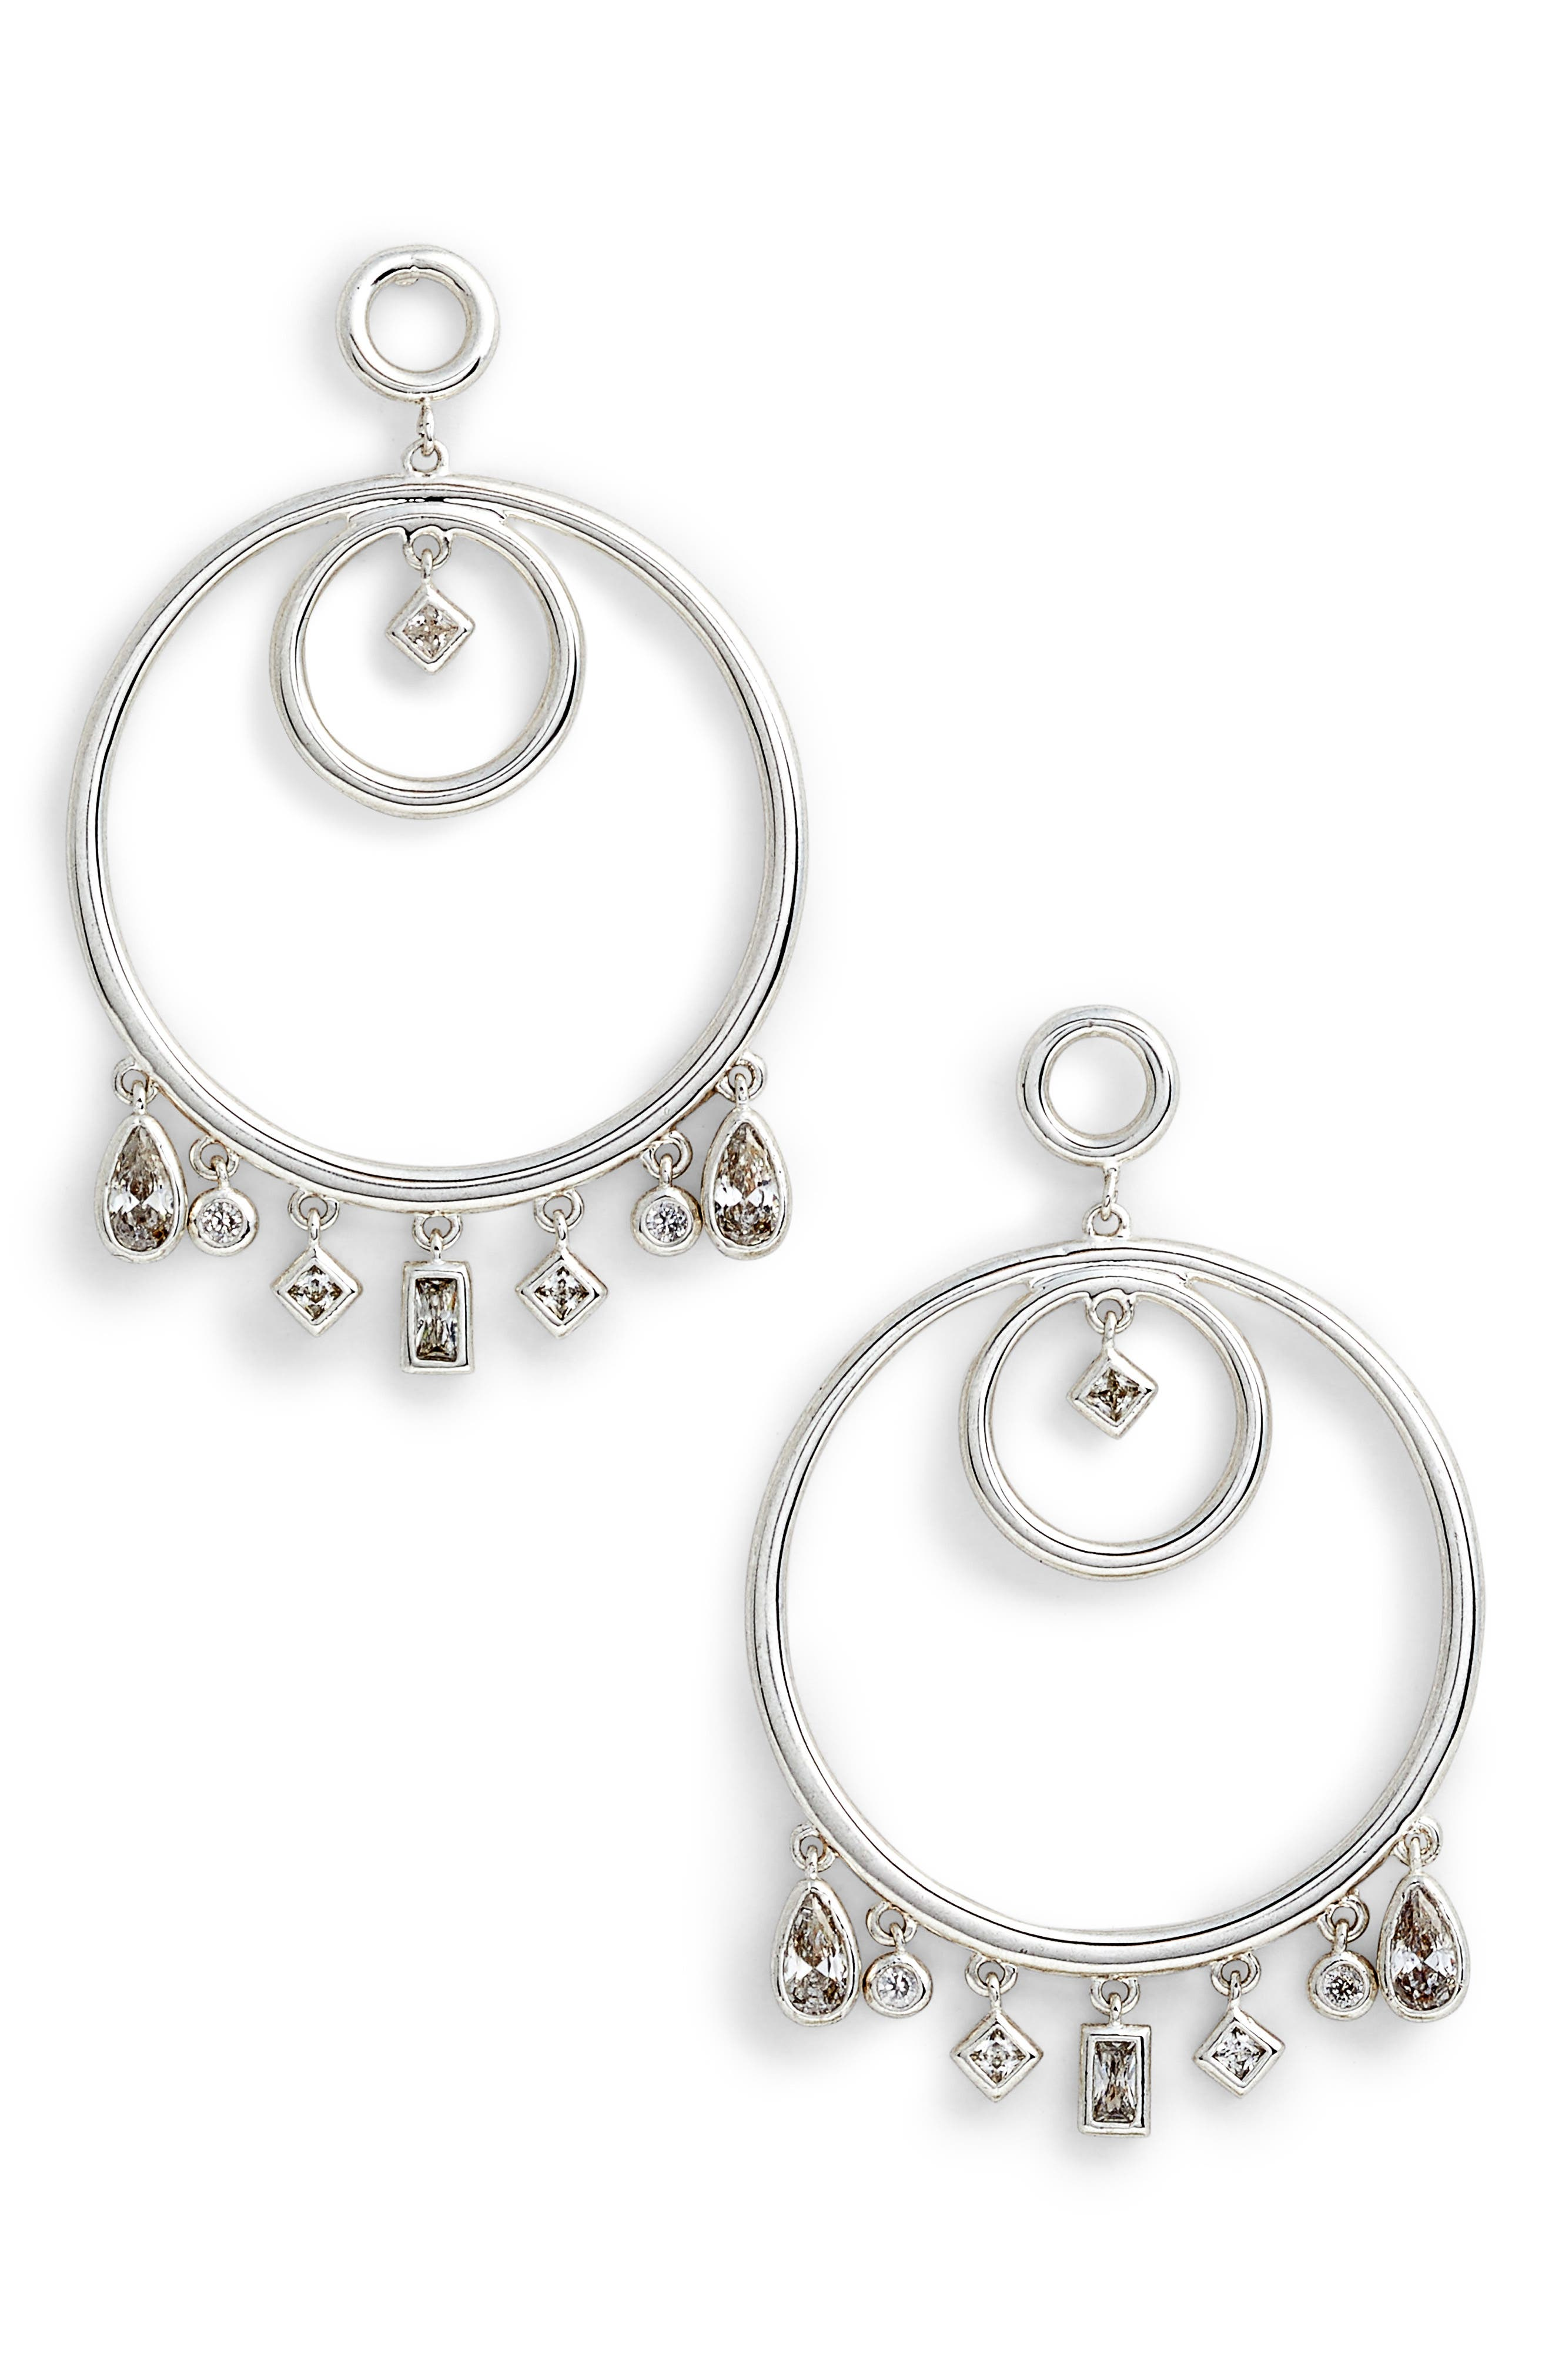 Hanging Jewel Frontal Hoop Earrings,                             Main thumbnail 1, color,                             040